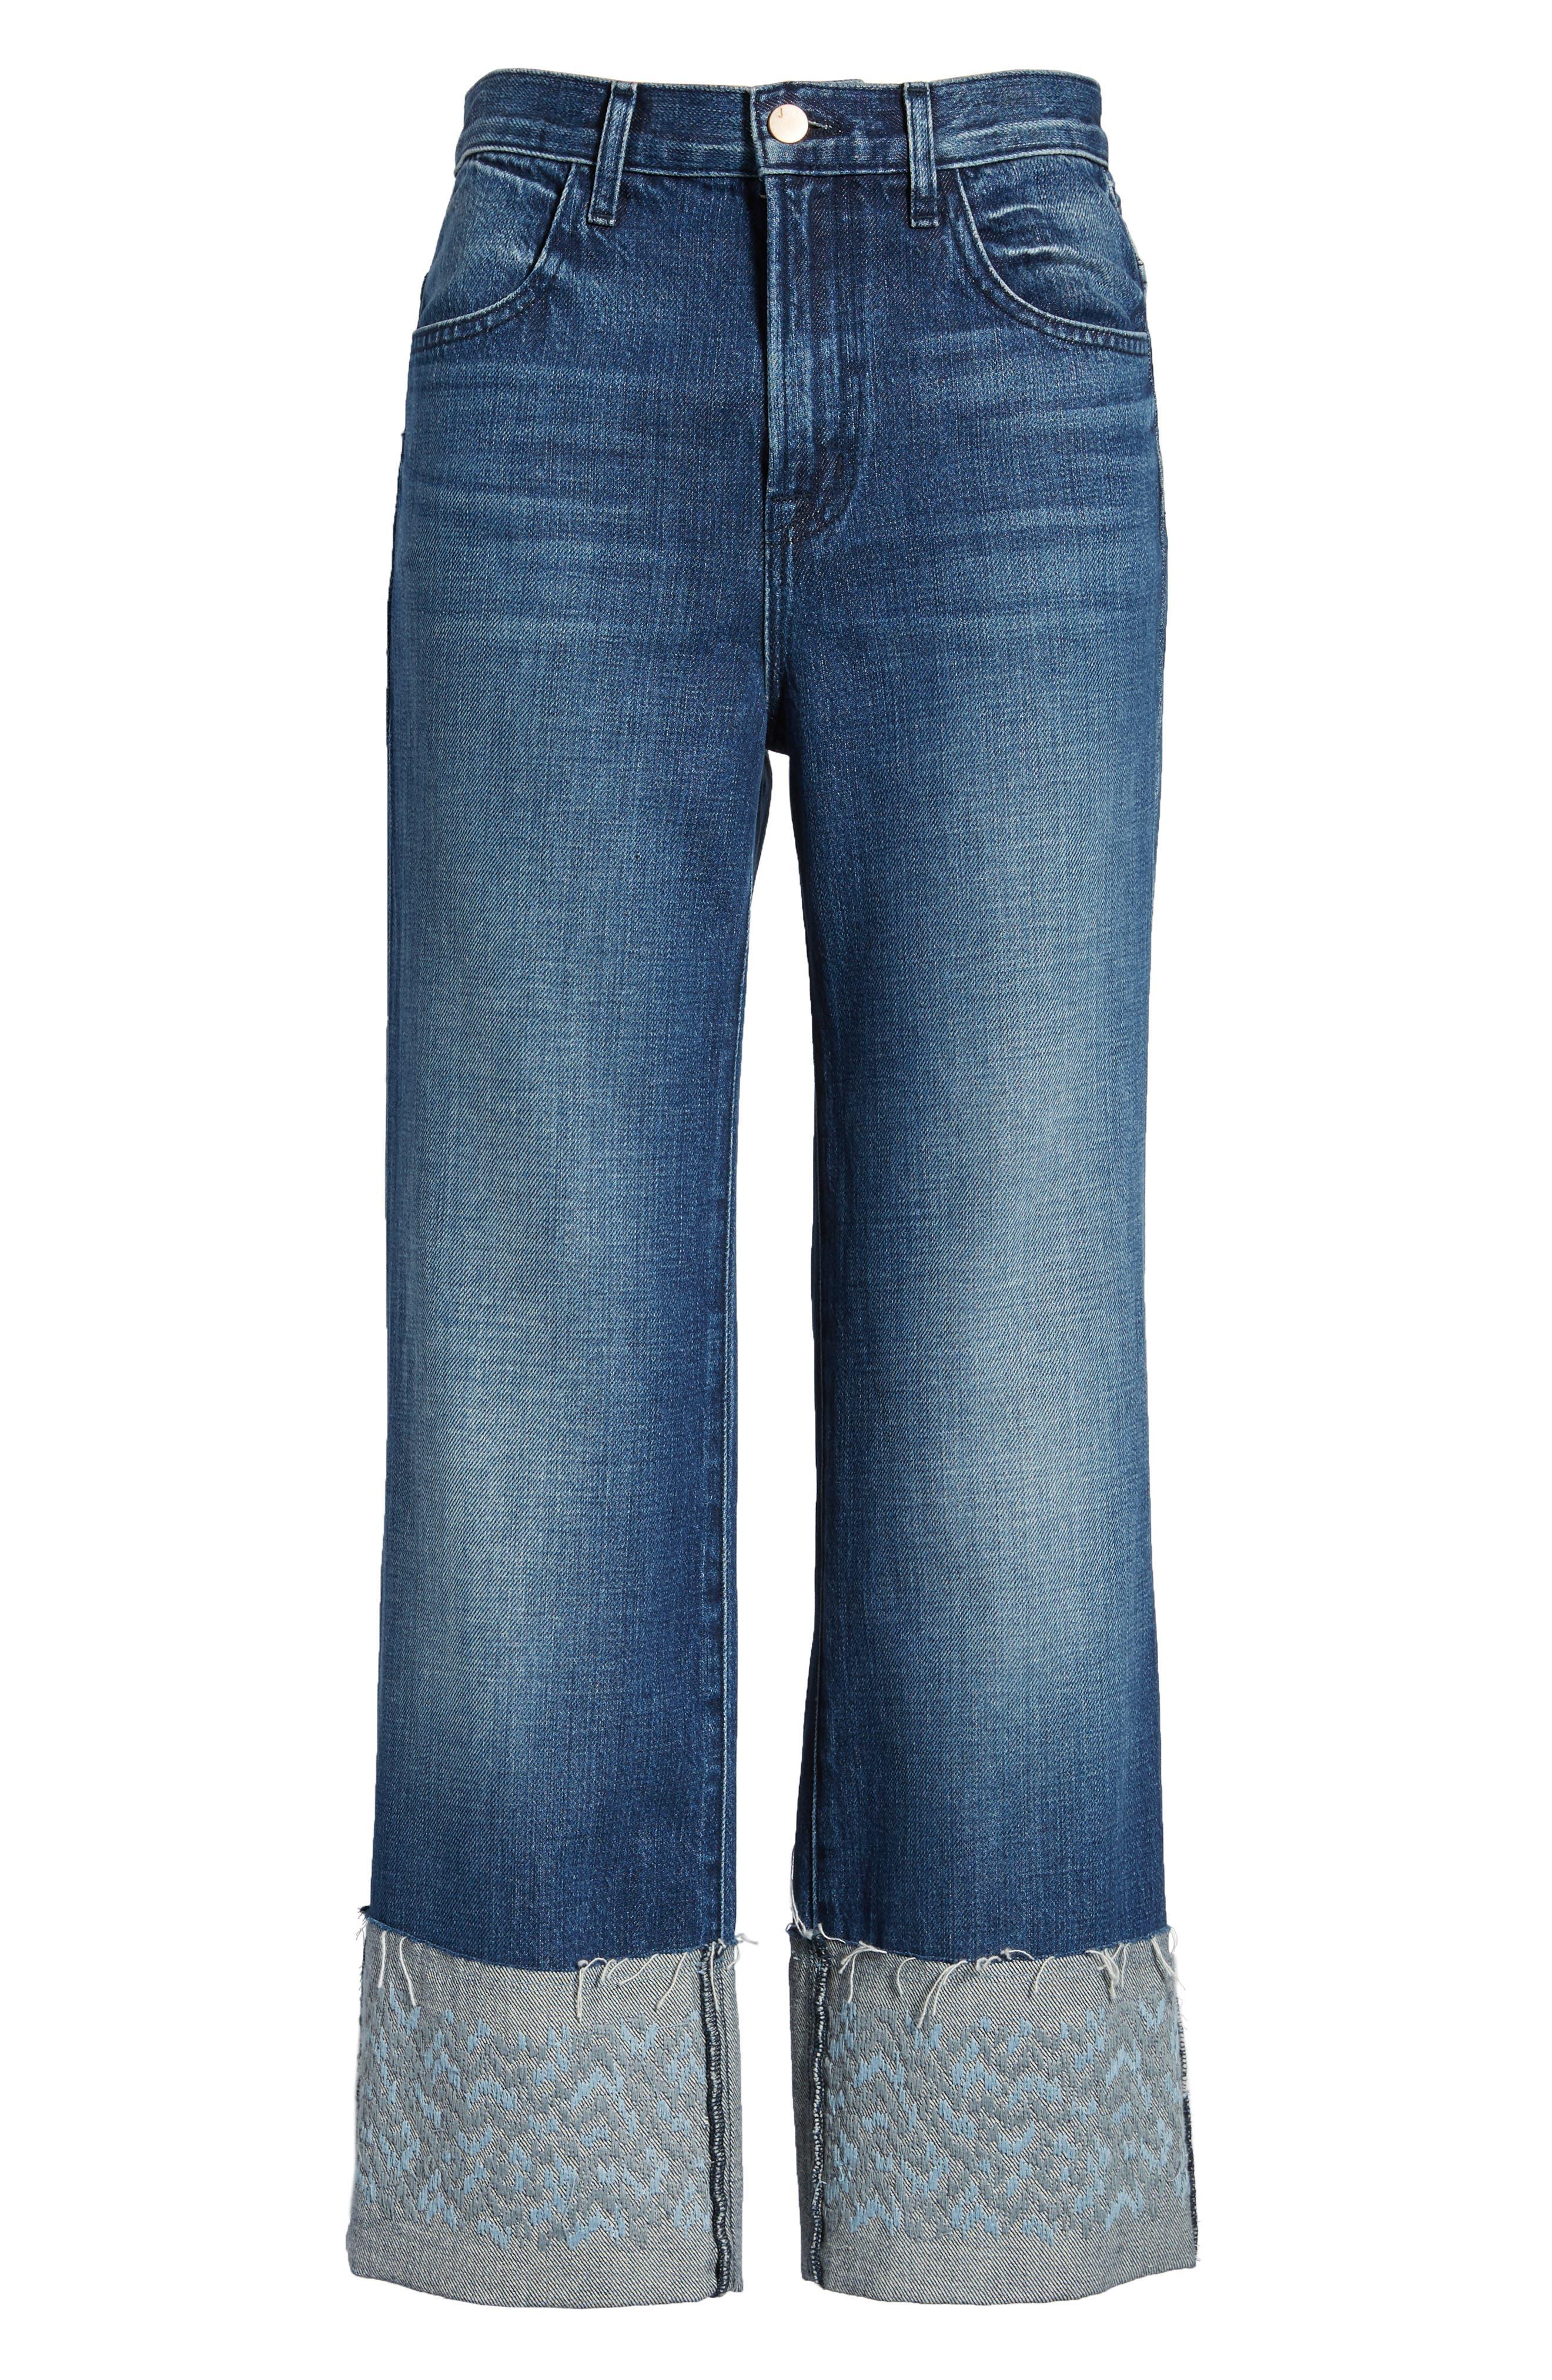 Joan High Waist Crop Wide Leg Jeans,                             Alternate thumbnail 7, color,                             409